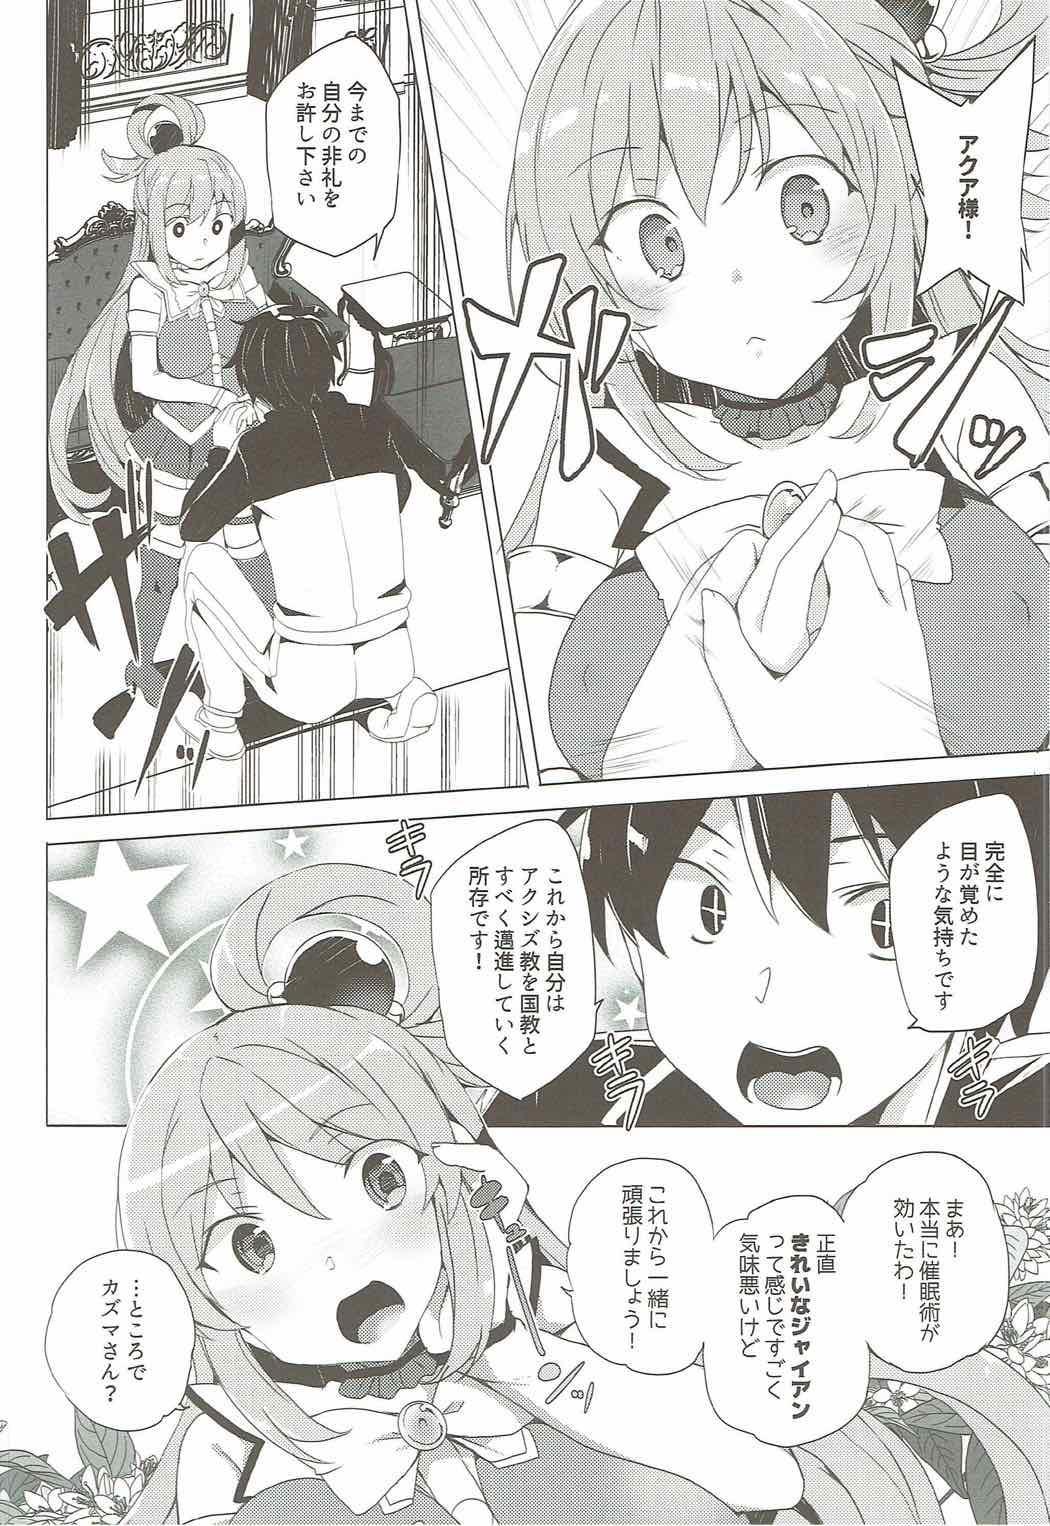 Axis-kyou ni Haitte kudasai 3